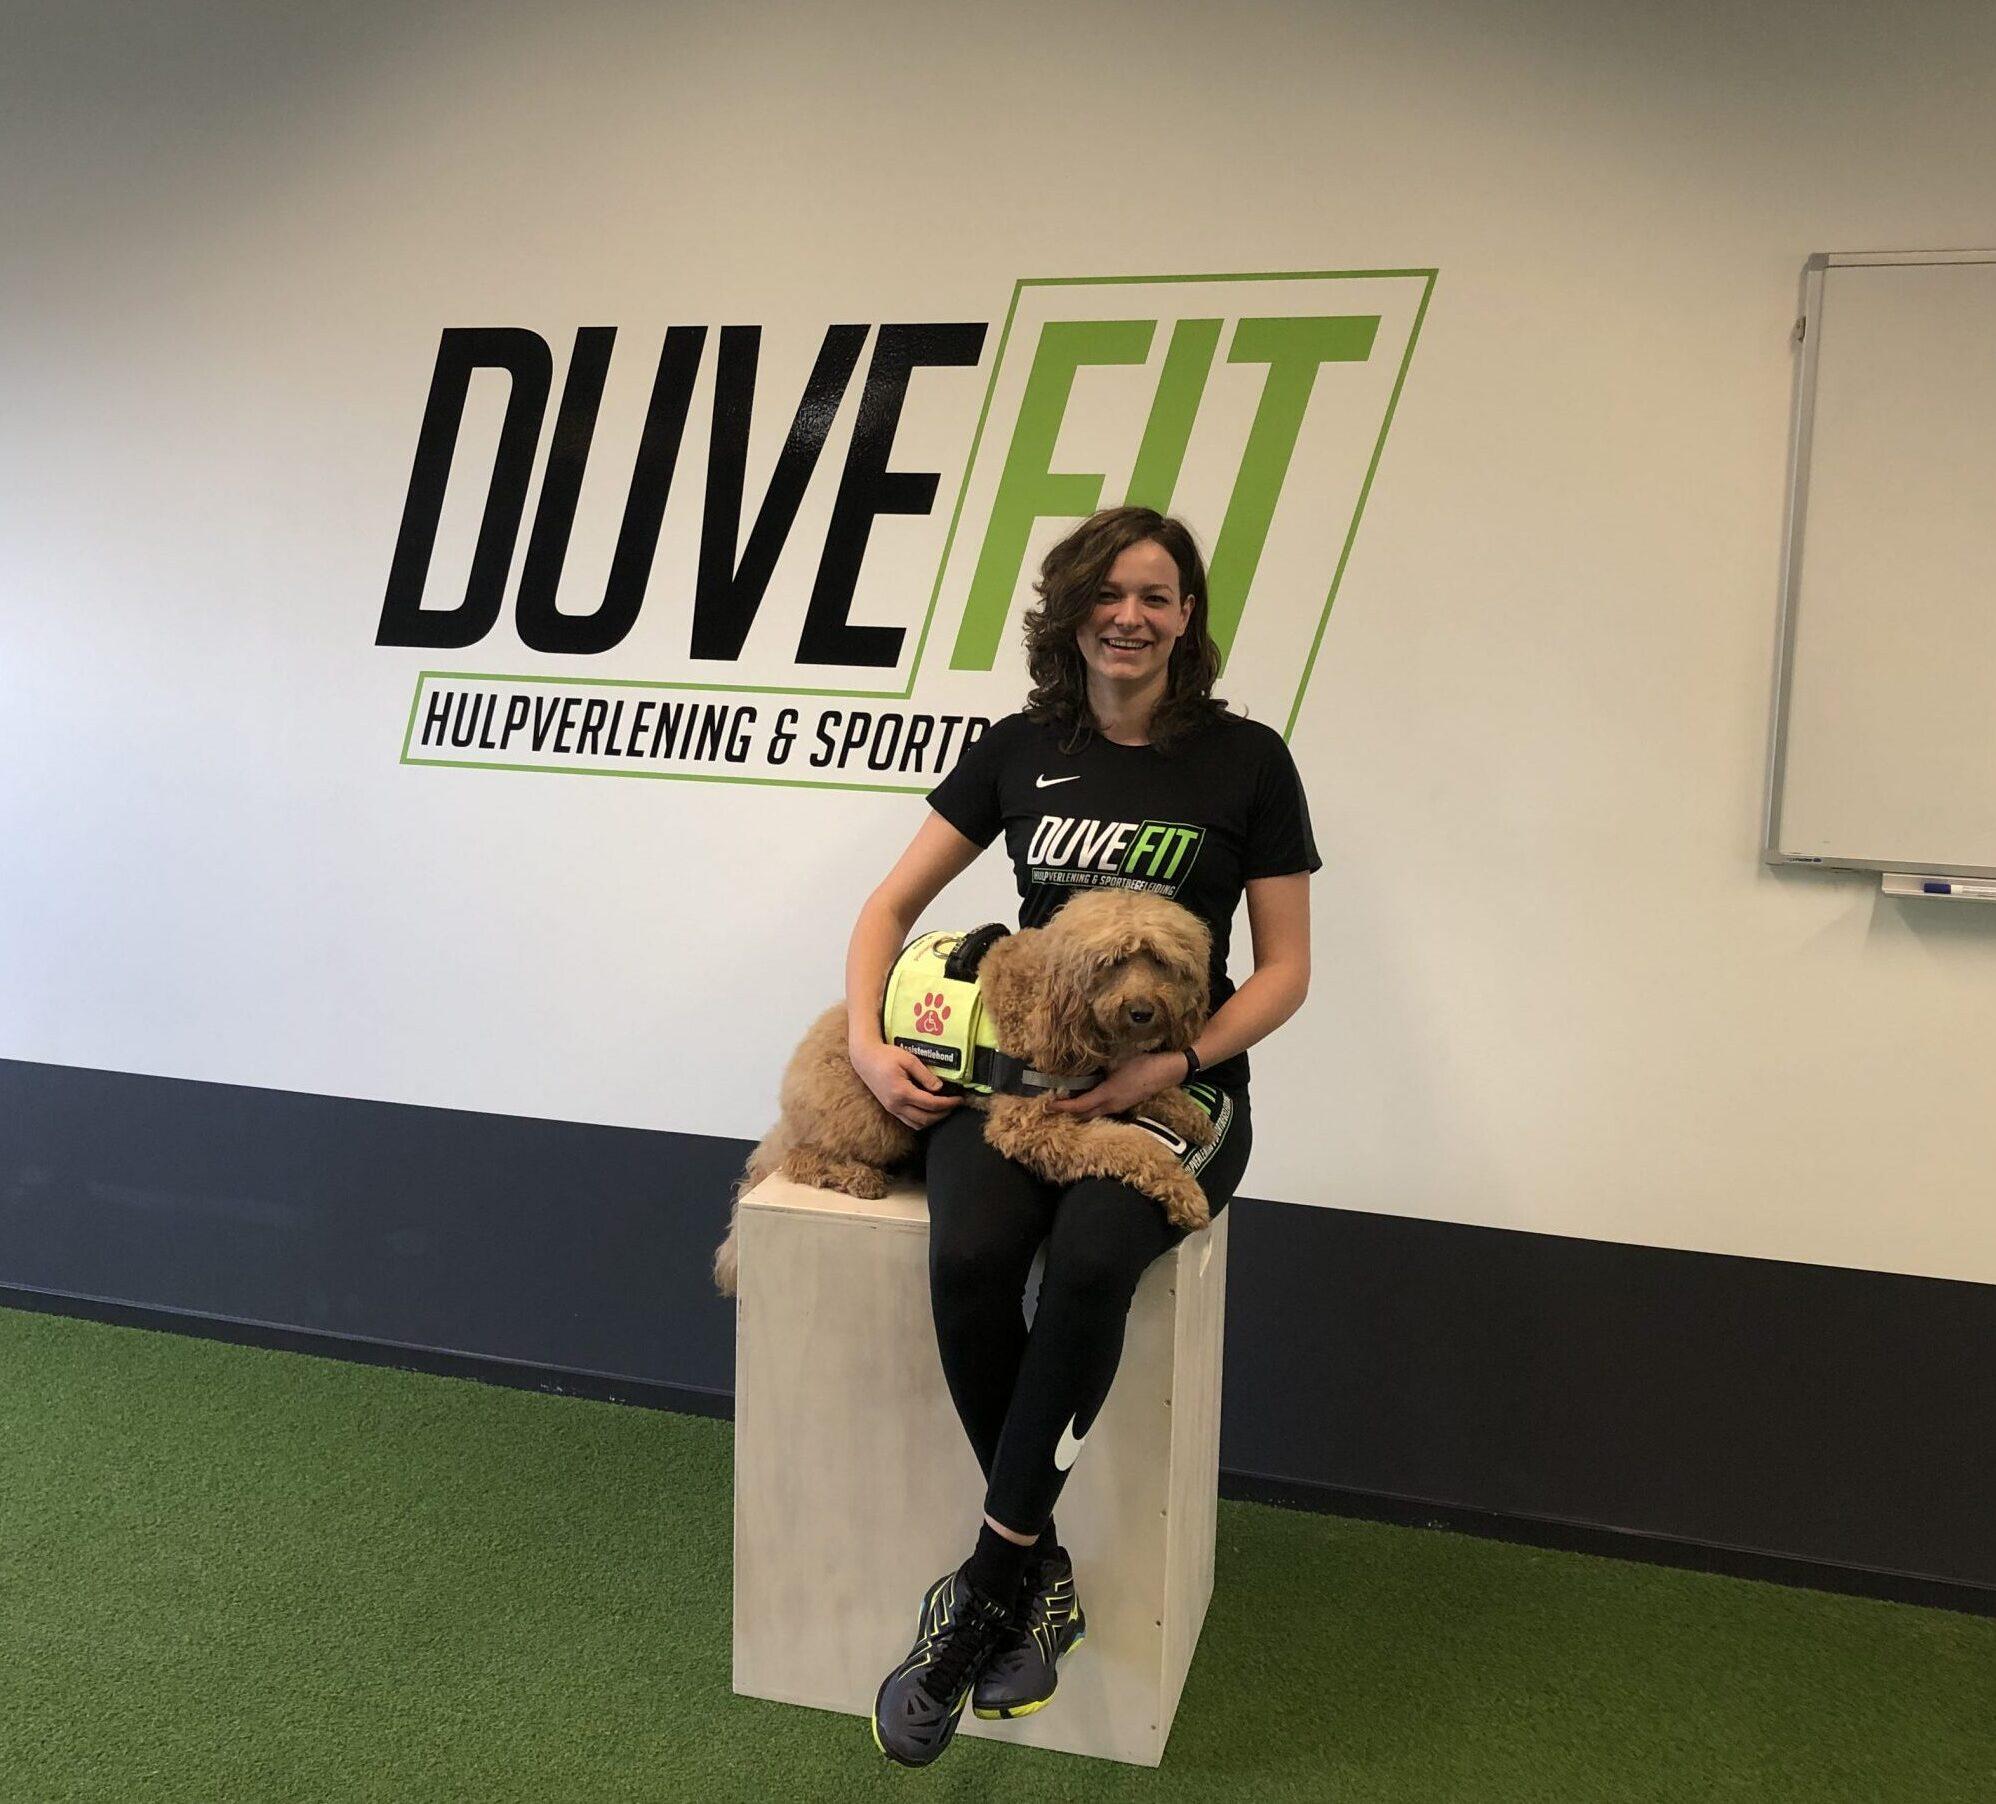 Duvefit-hulpverlening-personaltraining